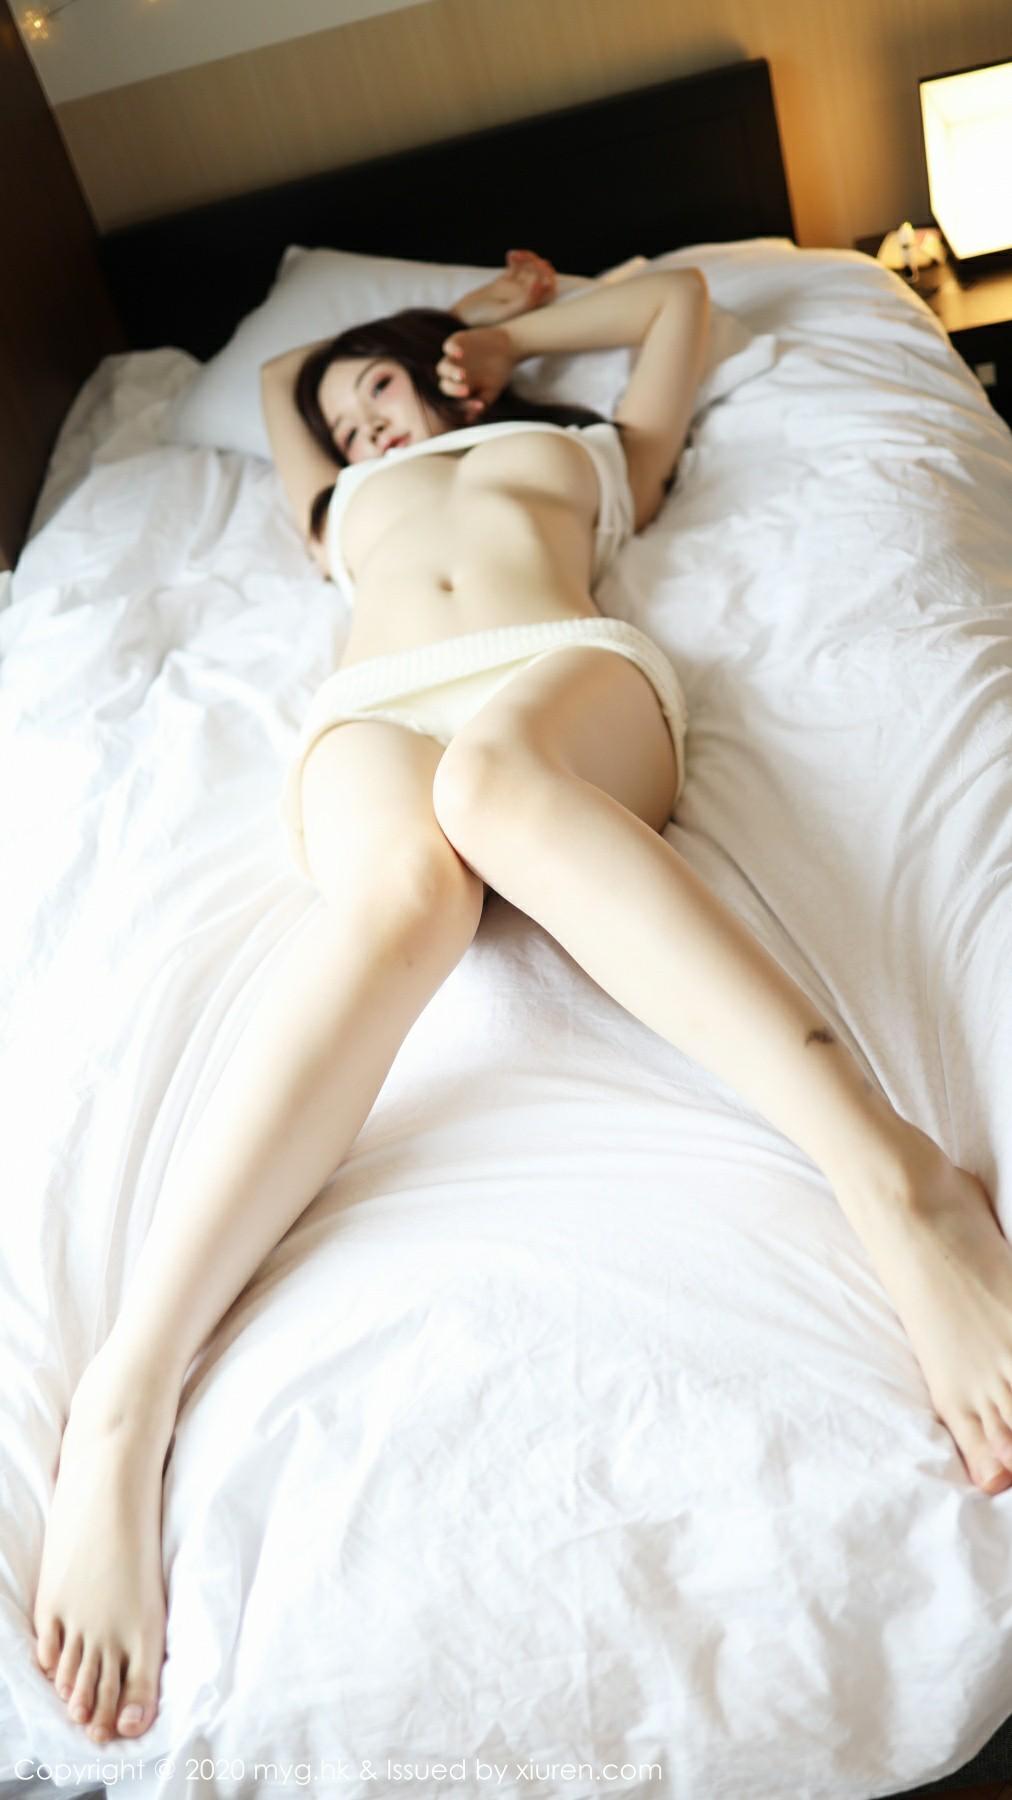 [MyGirl美媛馆]2020.01.07 VOL.422 糯美子Mini[48P] 美媛馆 第4张